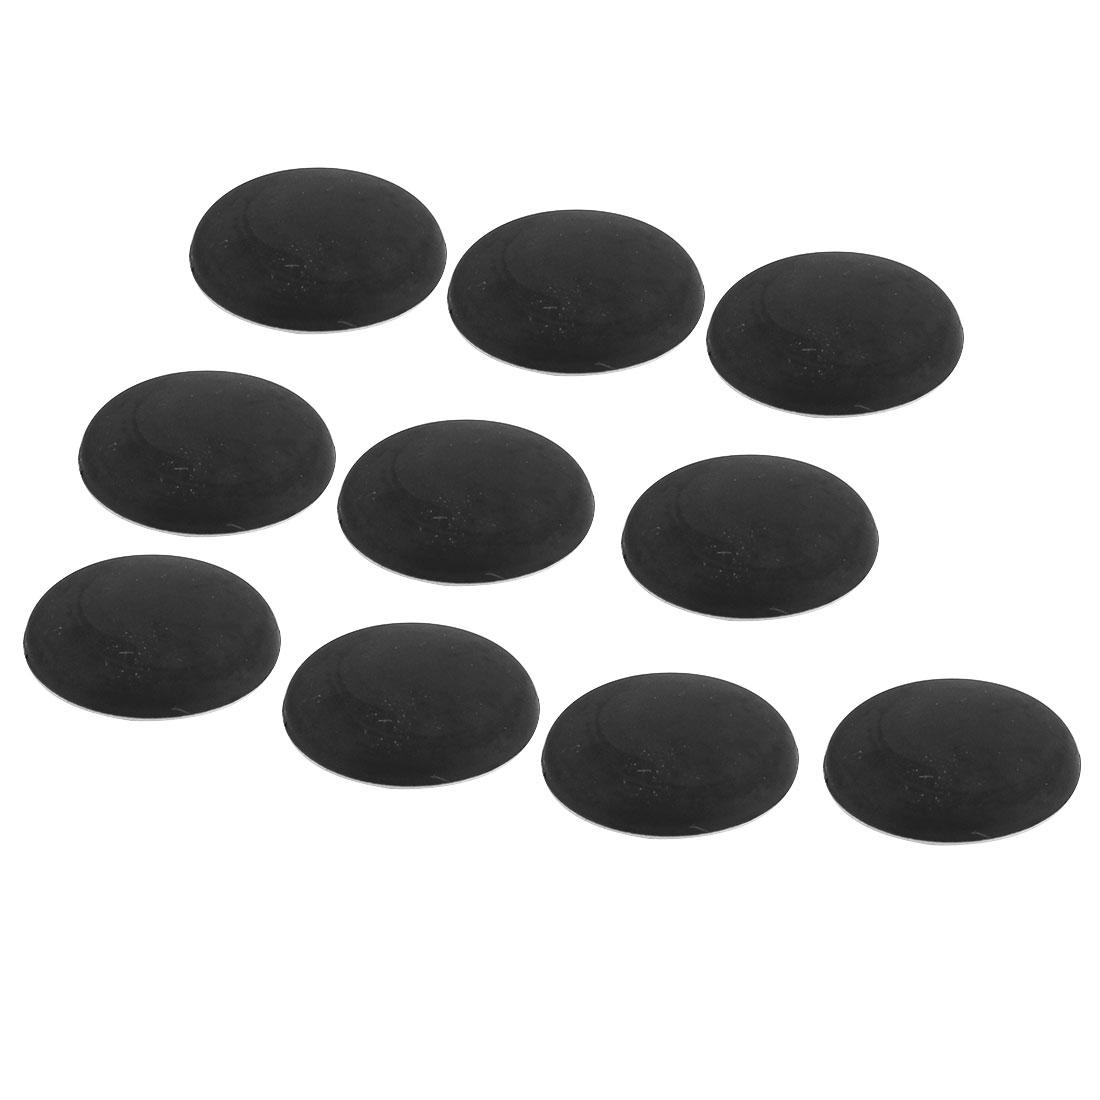 Household Plastic Wall Protectors Self Adhesive Door Handle Bumper Guard Stopper Black 10pcs